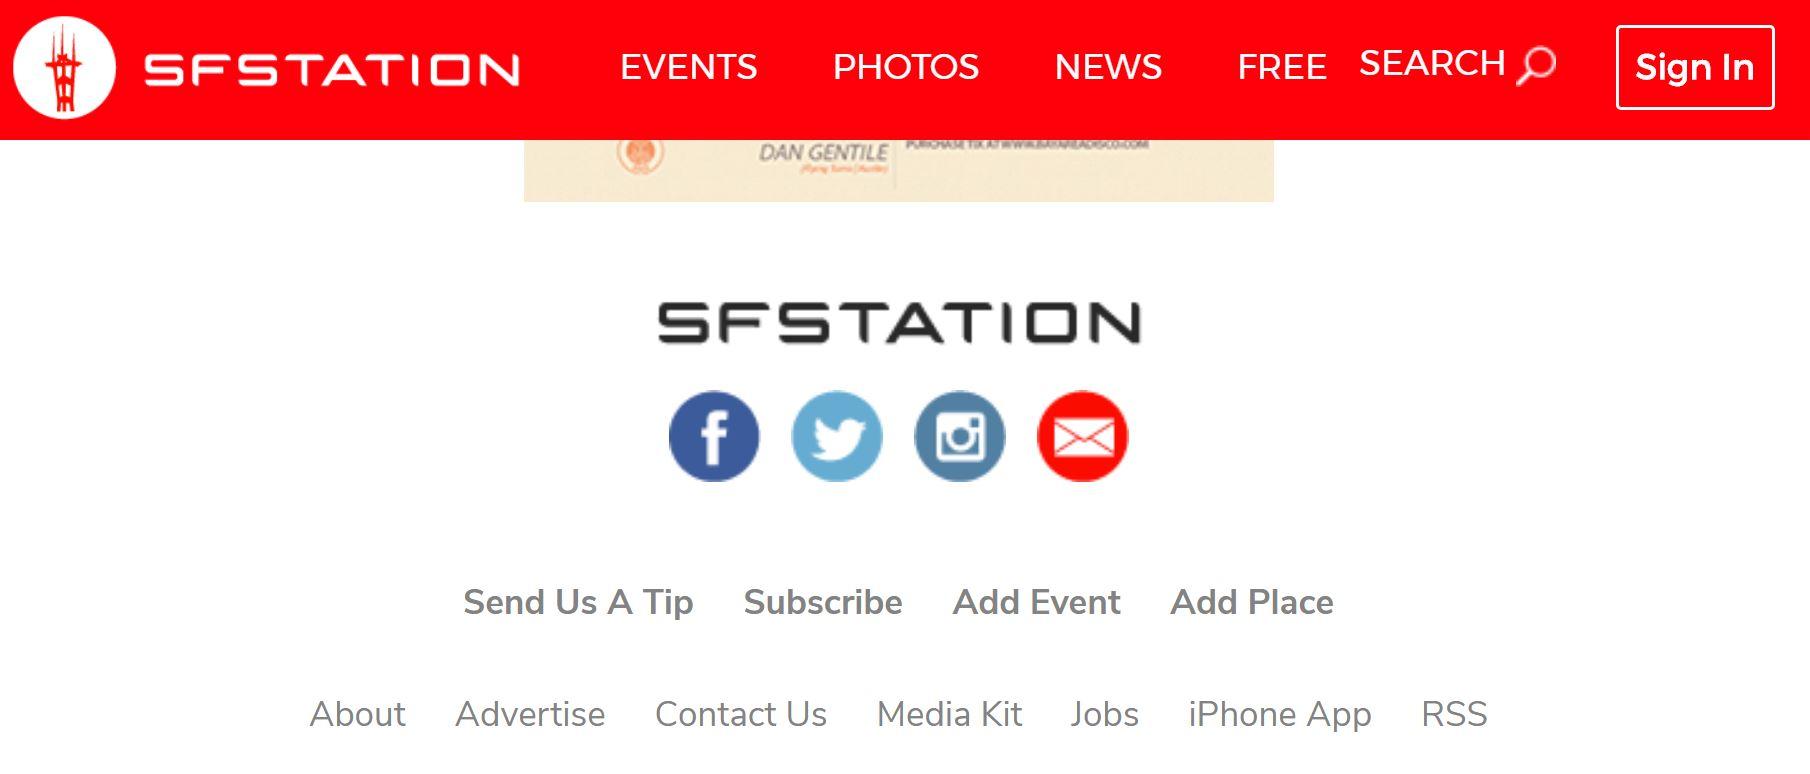 S.F. Station  2019, 2018, 2017, 2016, 2015